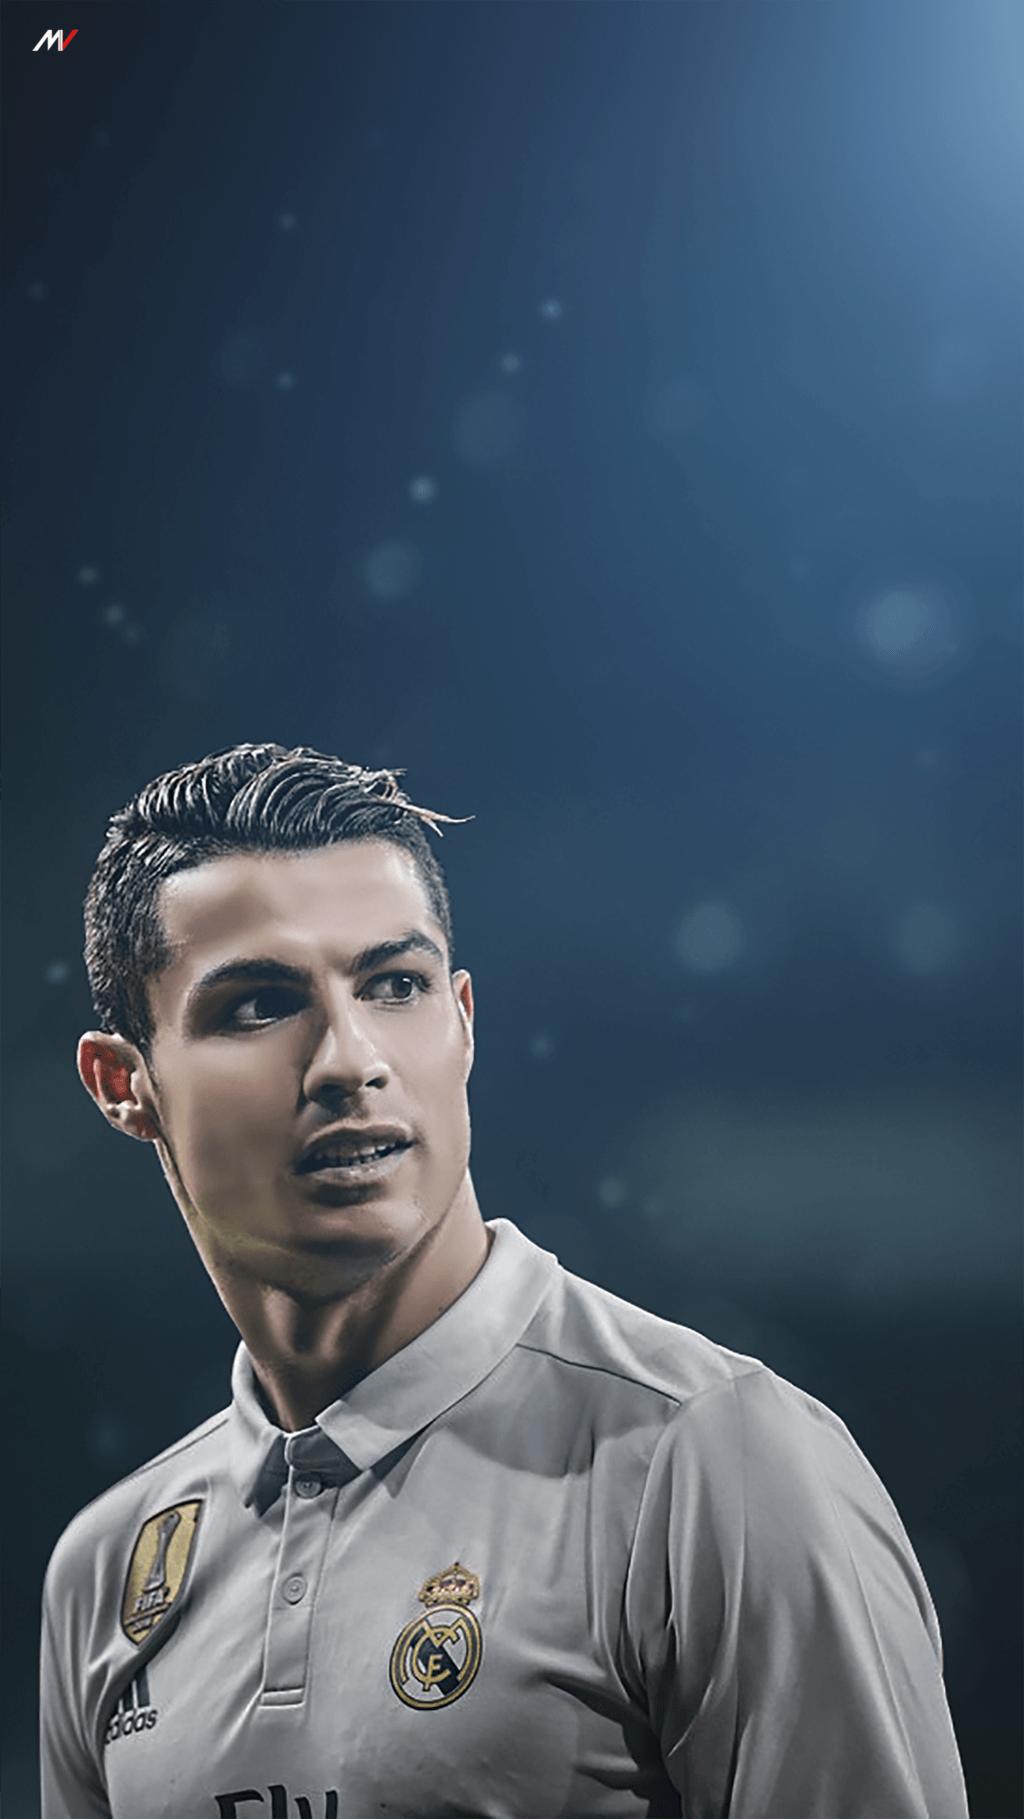 New Cristiano Ronaldo 2017 Wallpapers - Wallpaper Cave